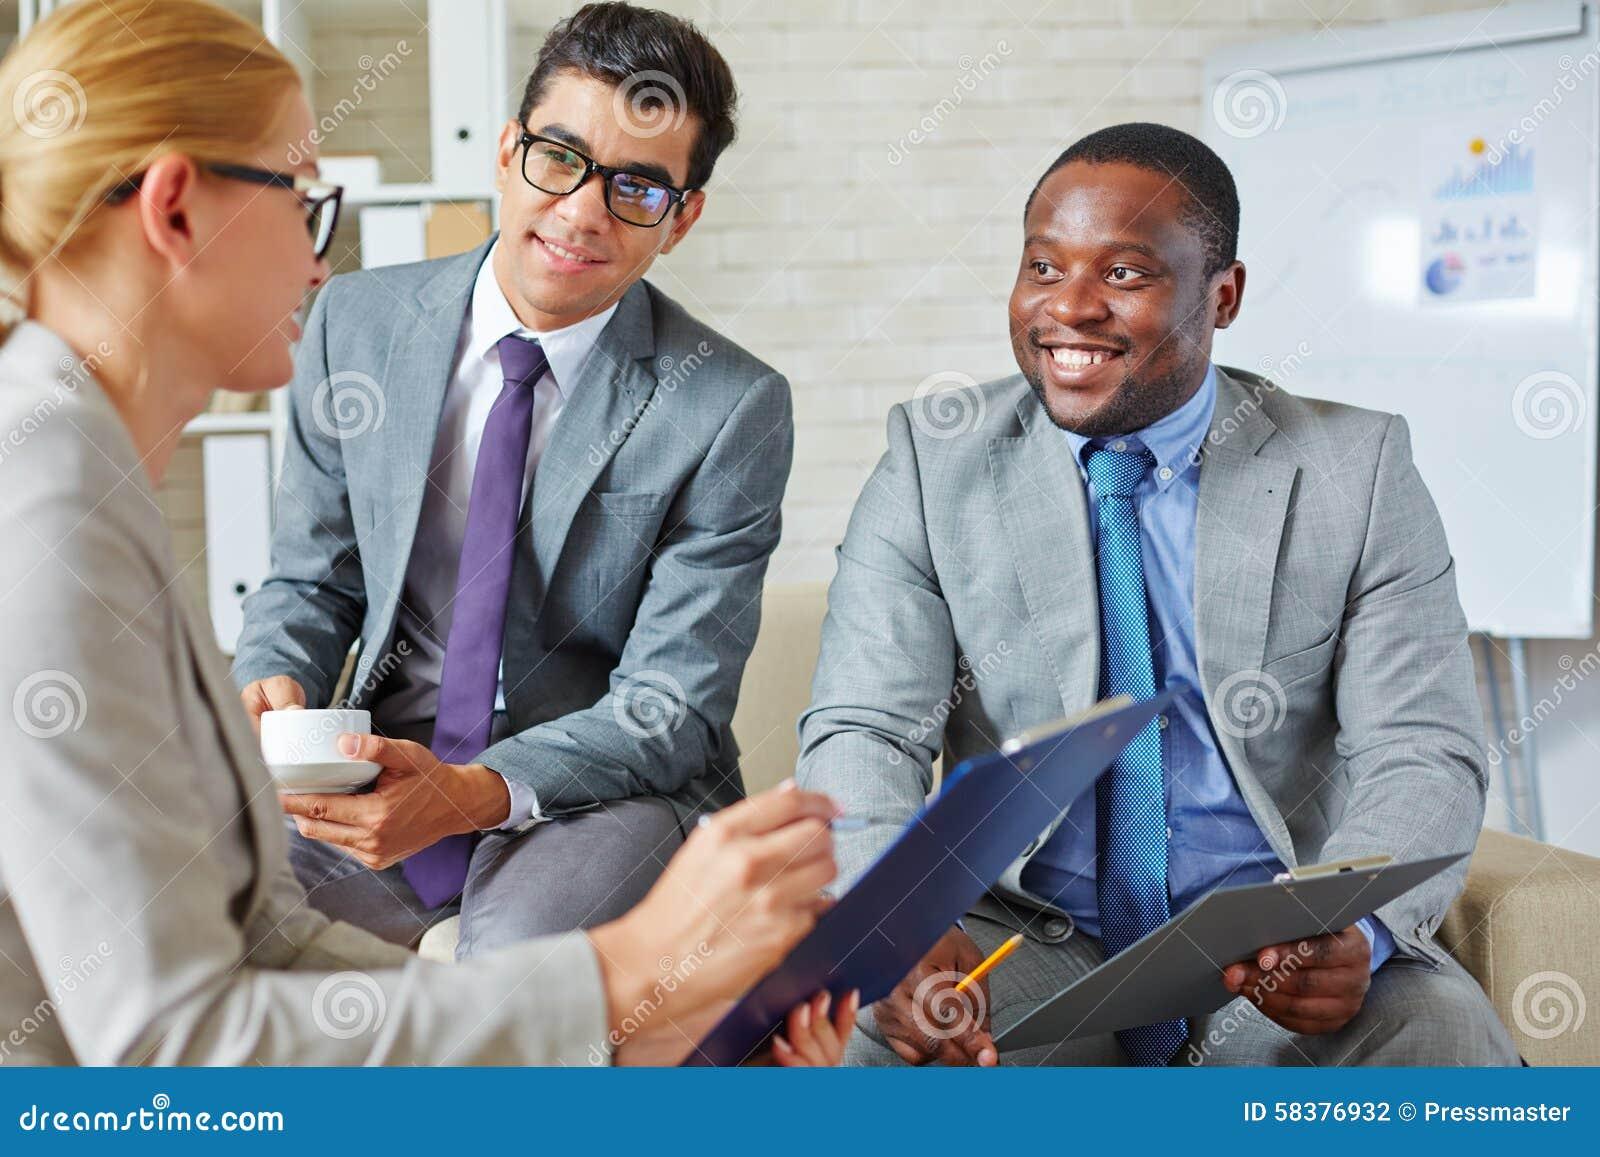 Amiable partners stock photo. Image of employee, agent